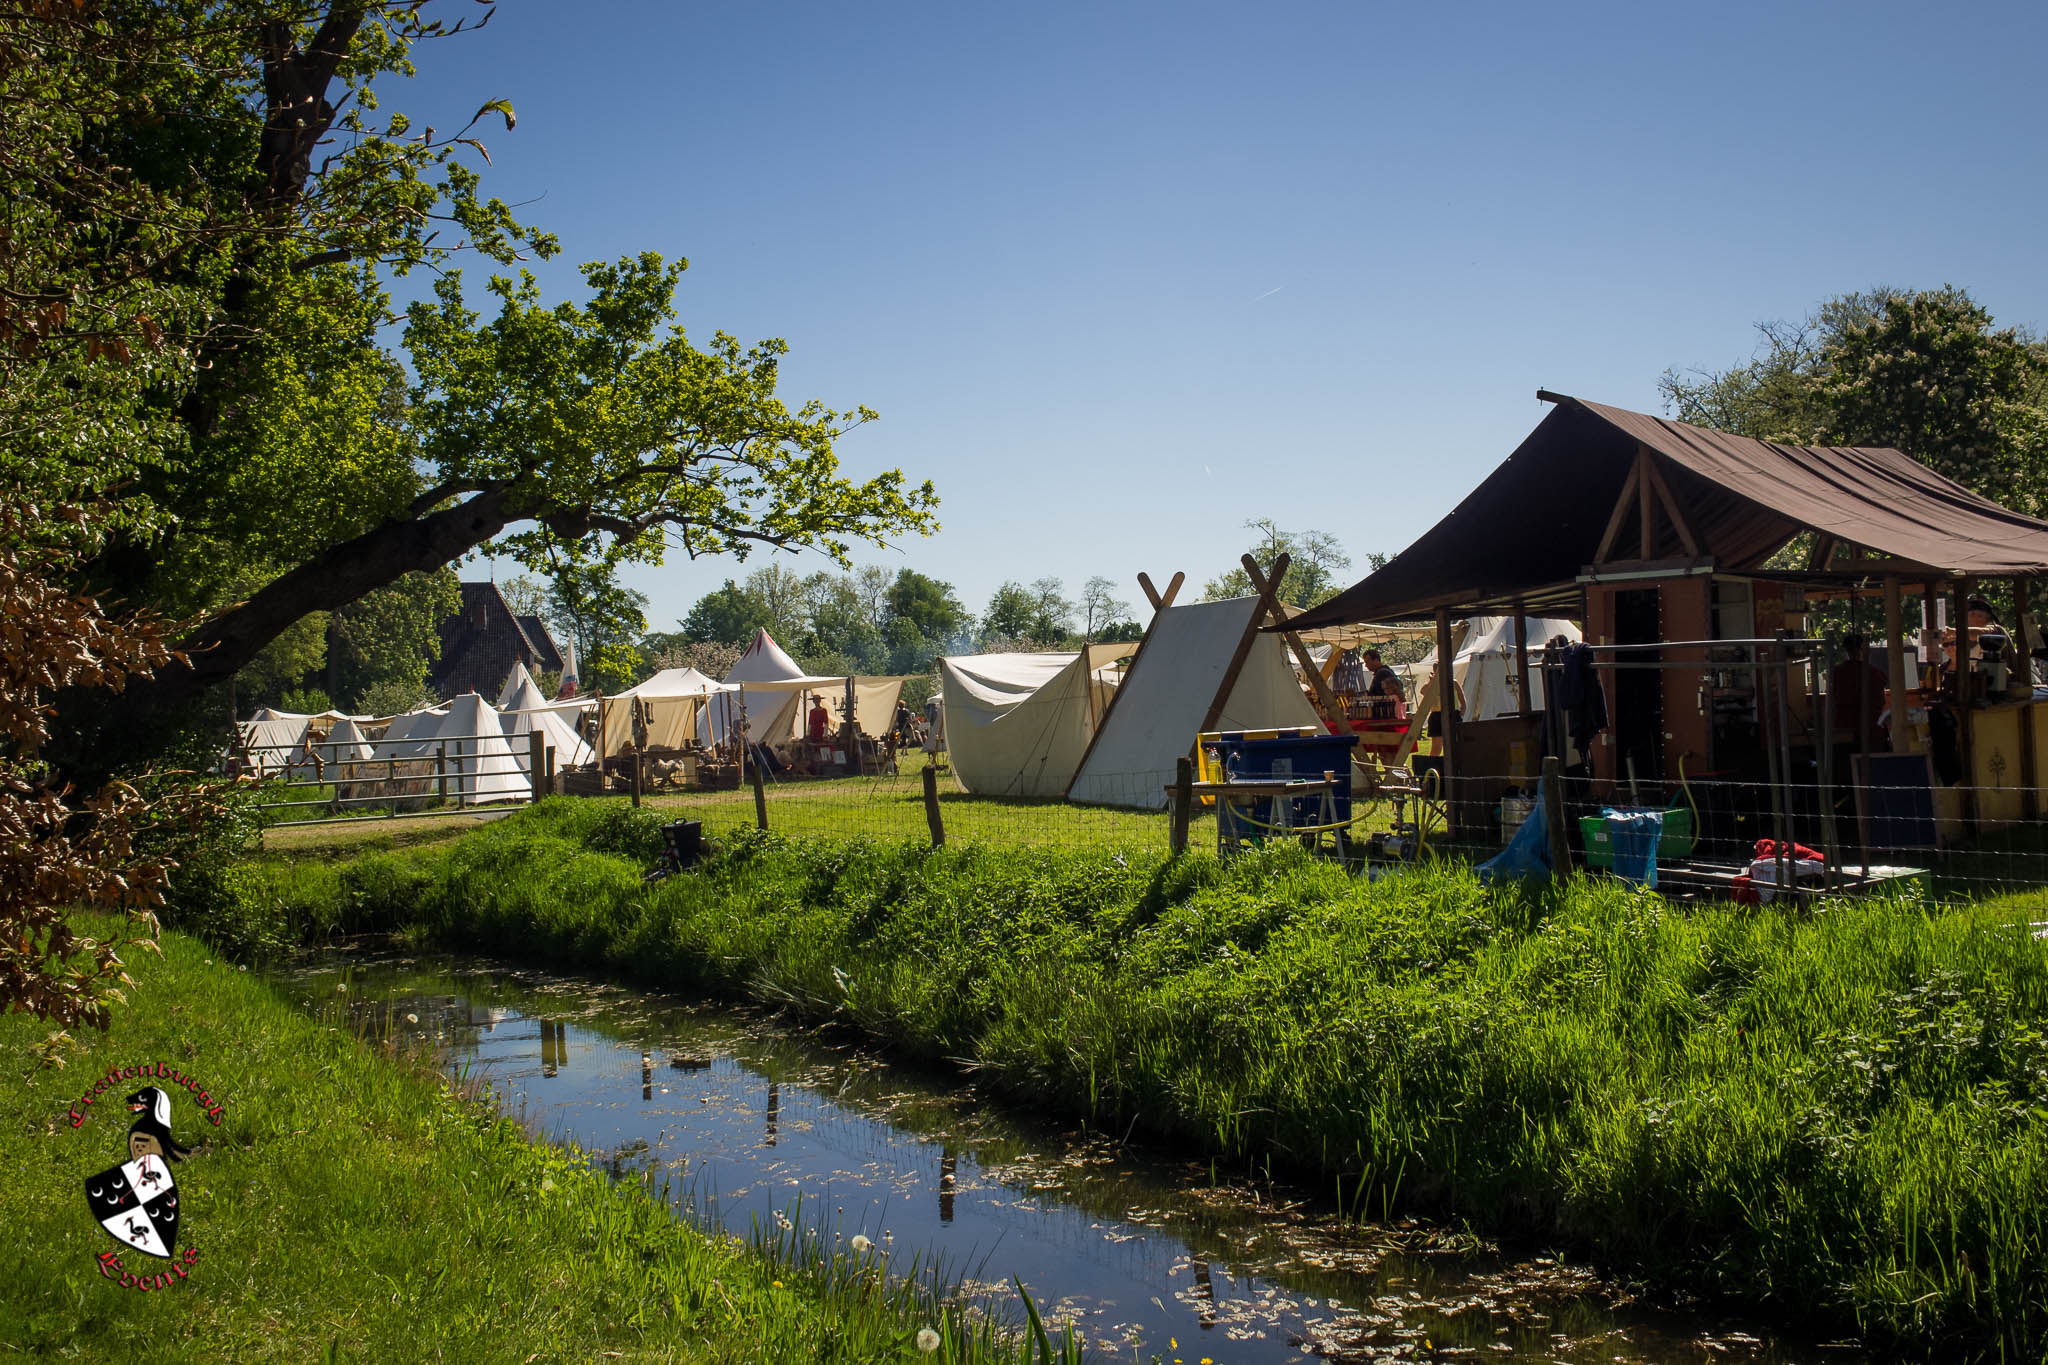 Middeleeuws-Festijn-Cannenburgh-2018-Algemeen-Ellen-la-Faille-19